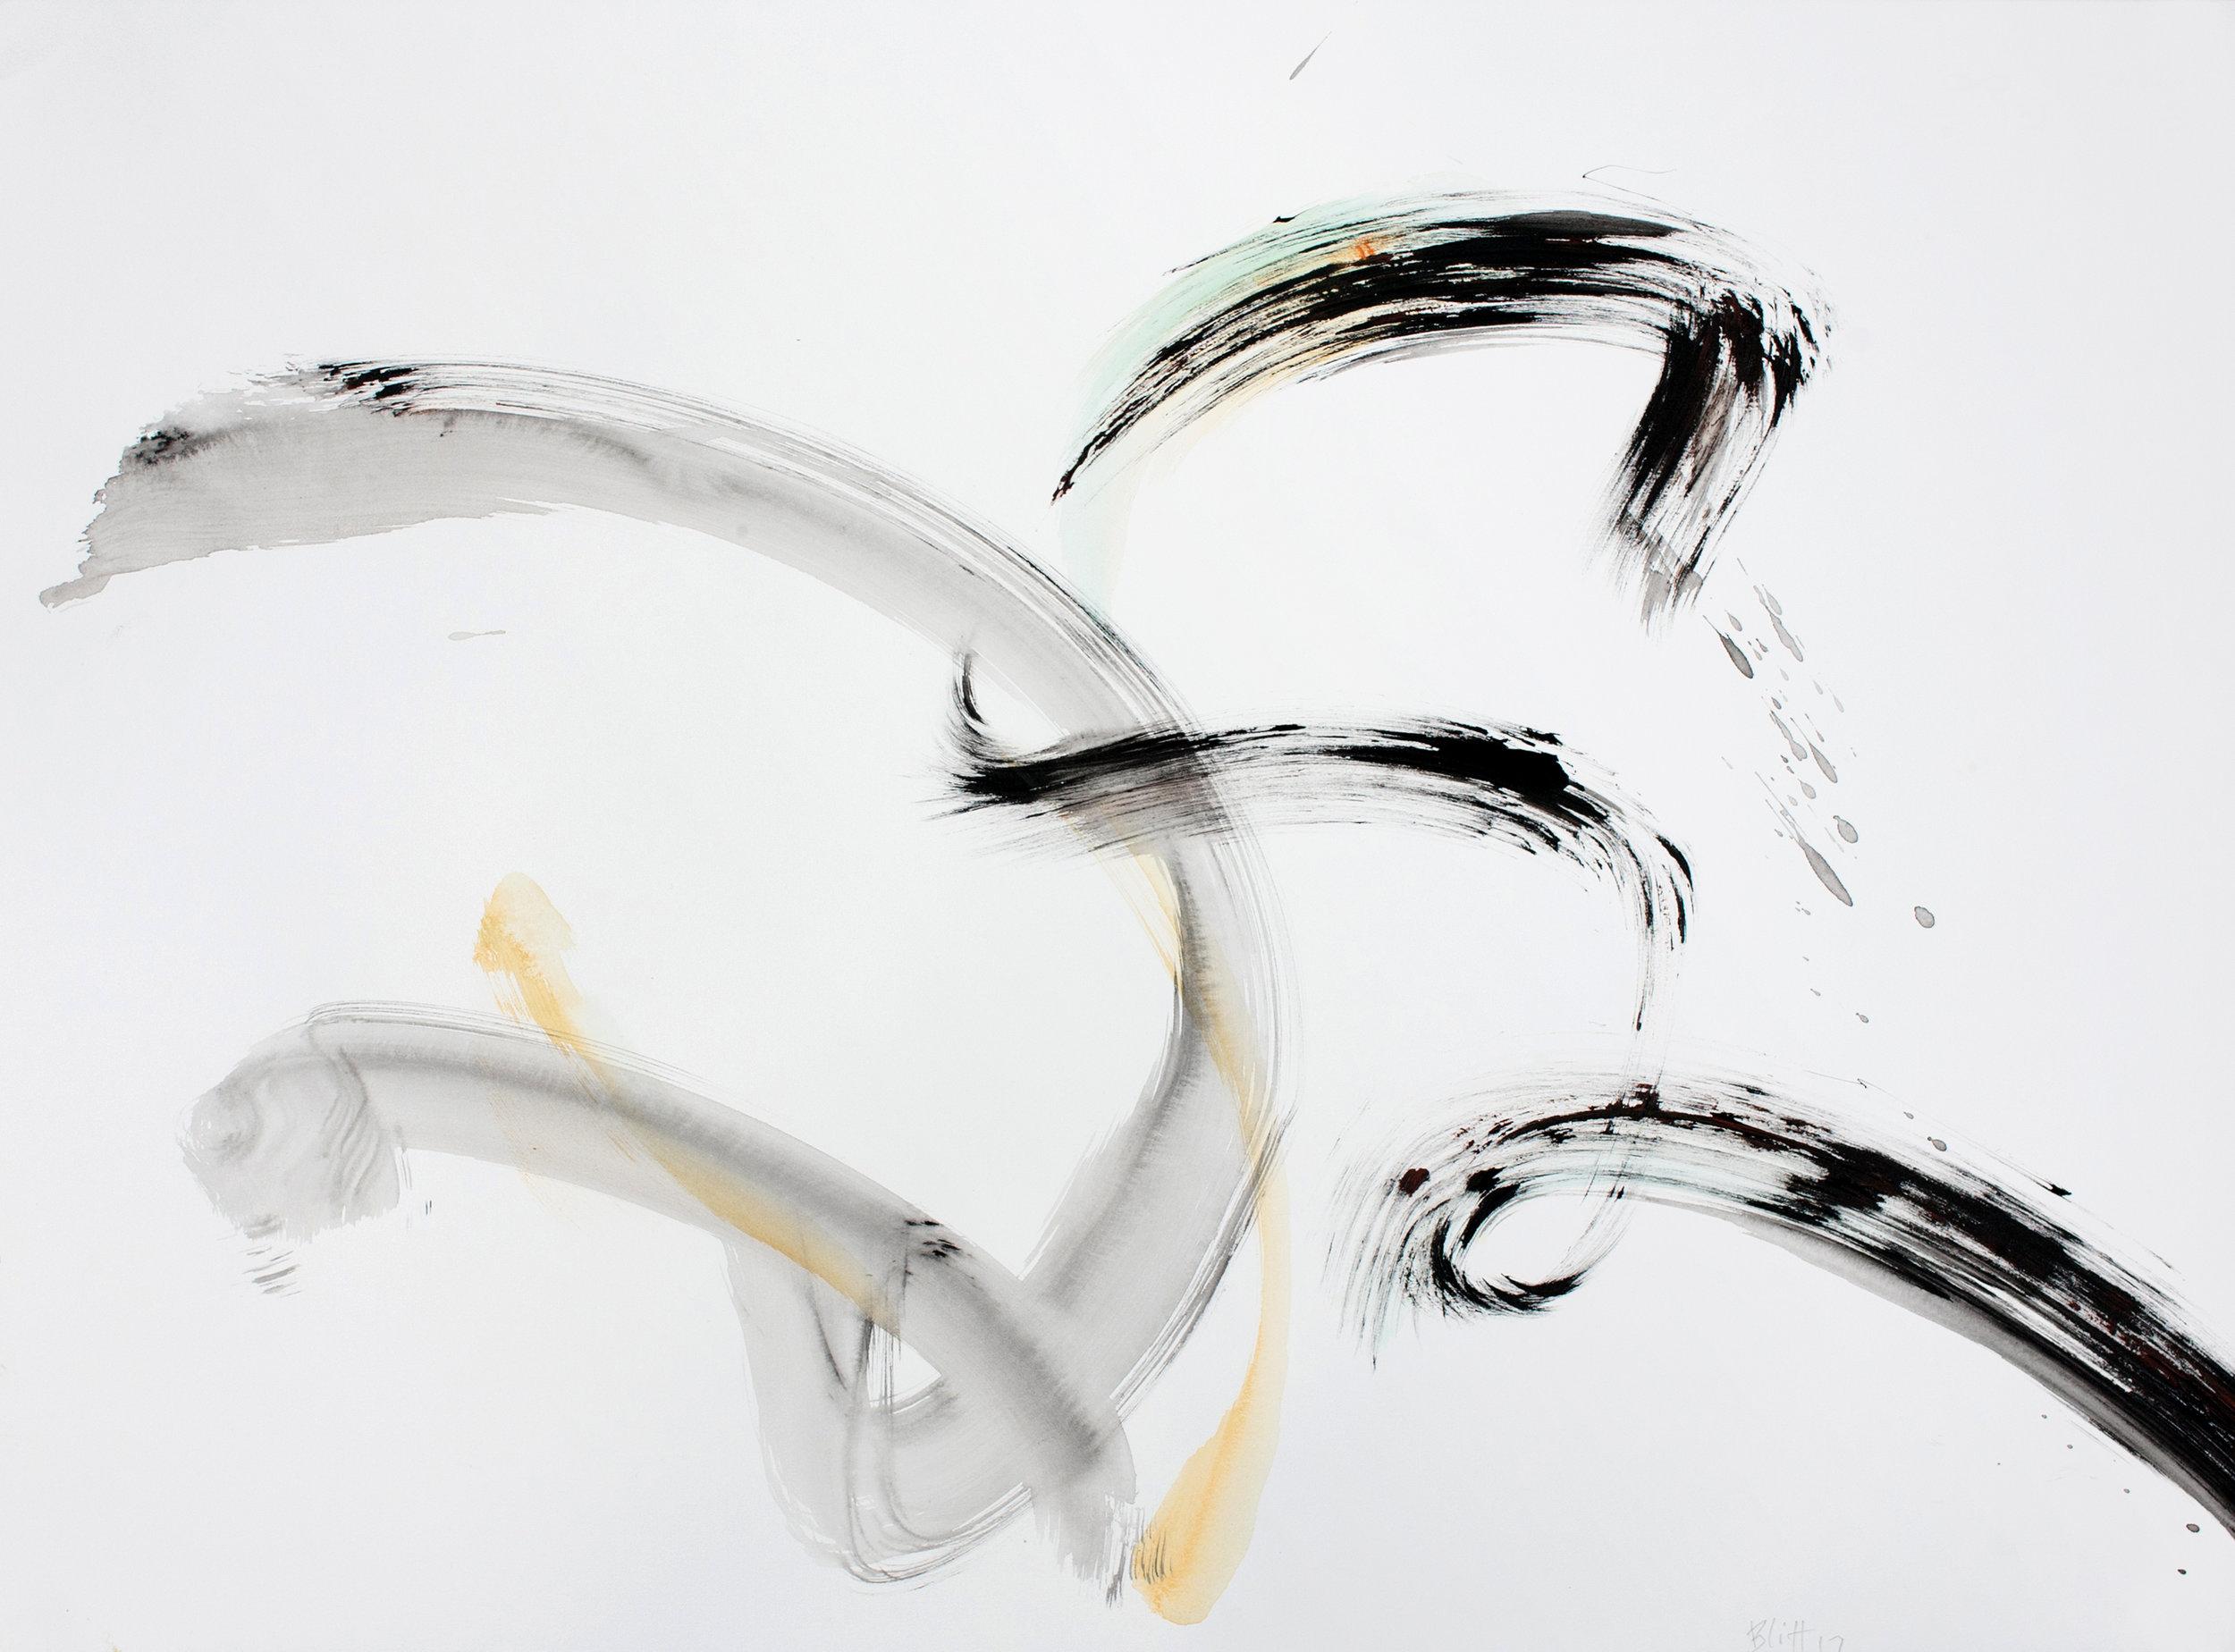 2017, acrylic on paper, 22x30 in2017, acrylic on paper, 22x30 in